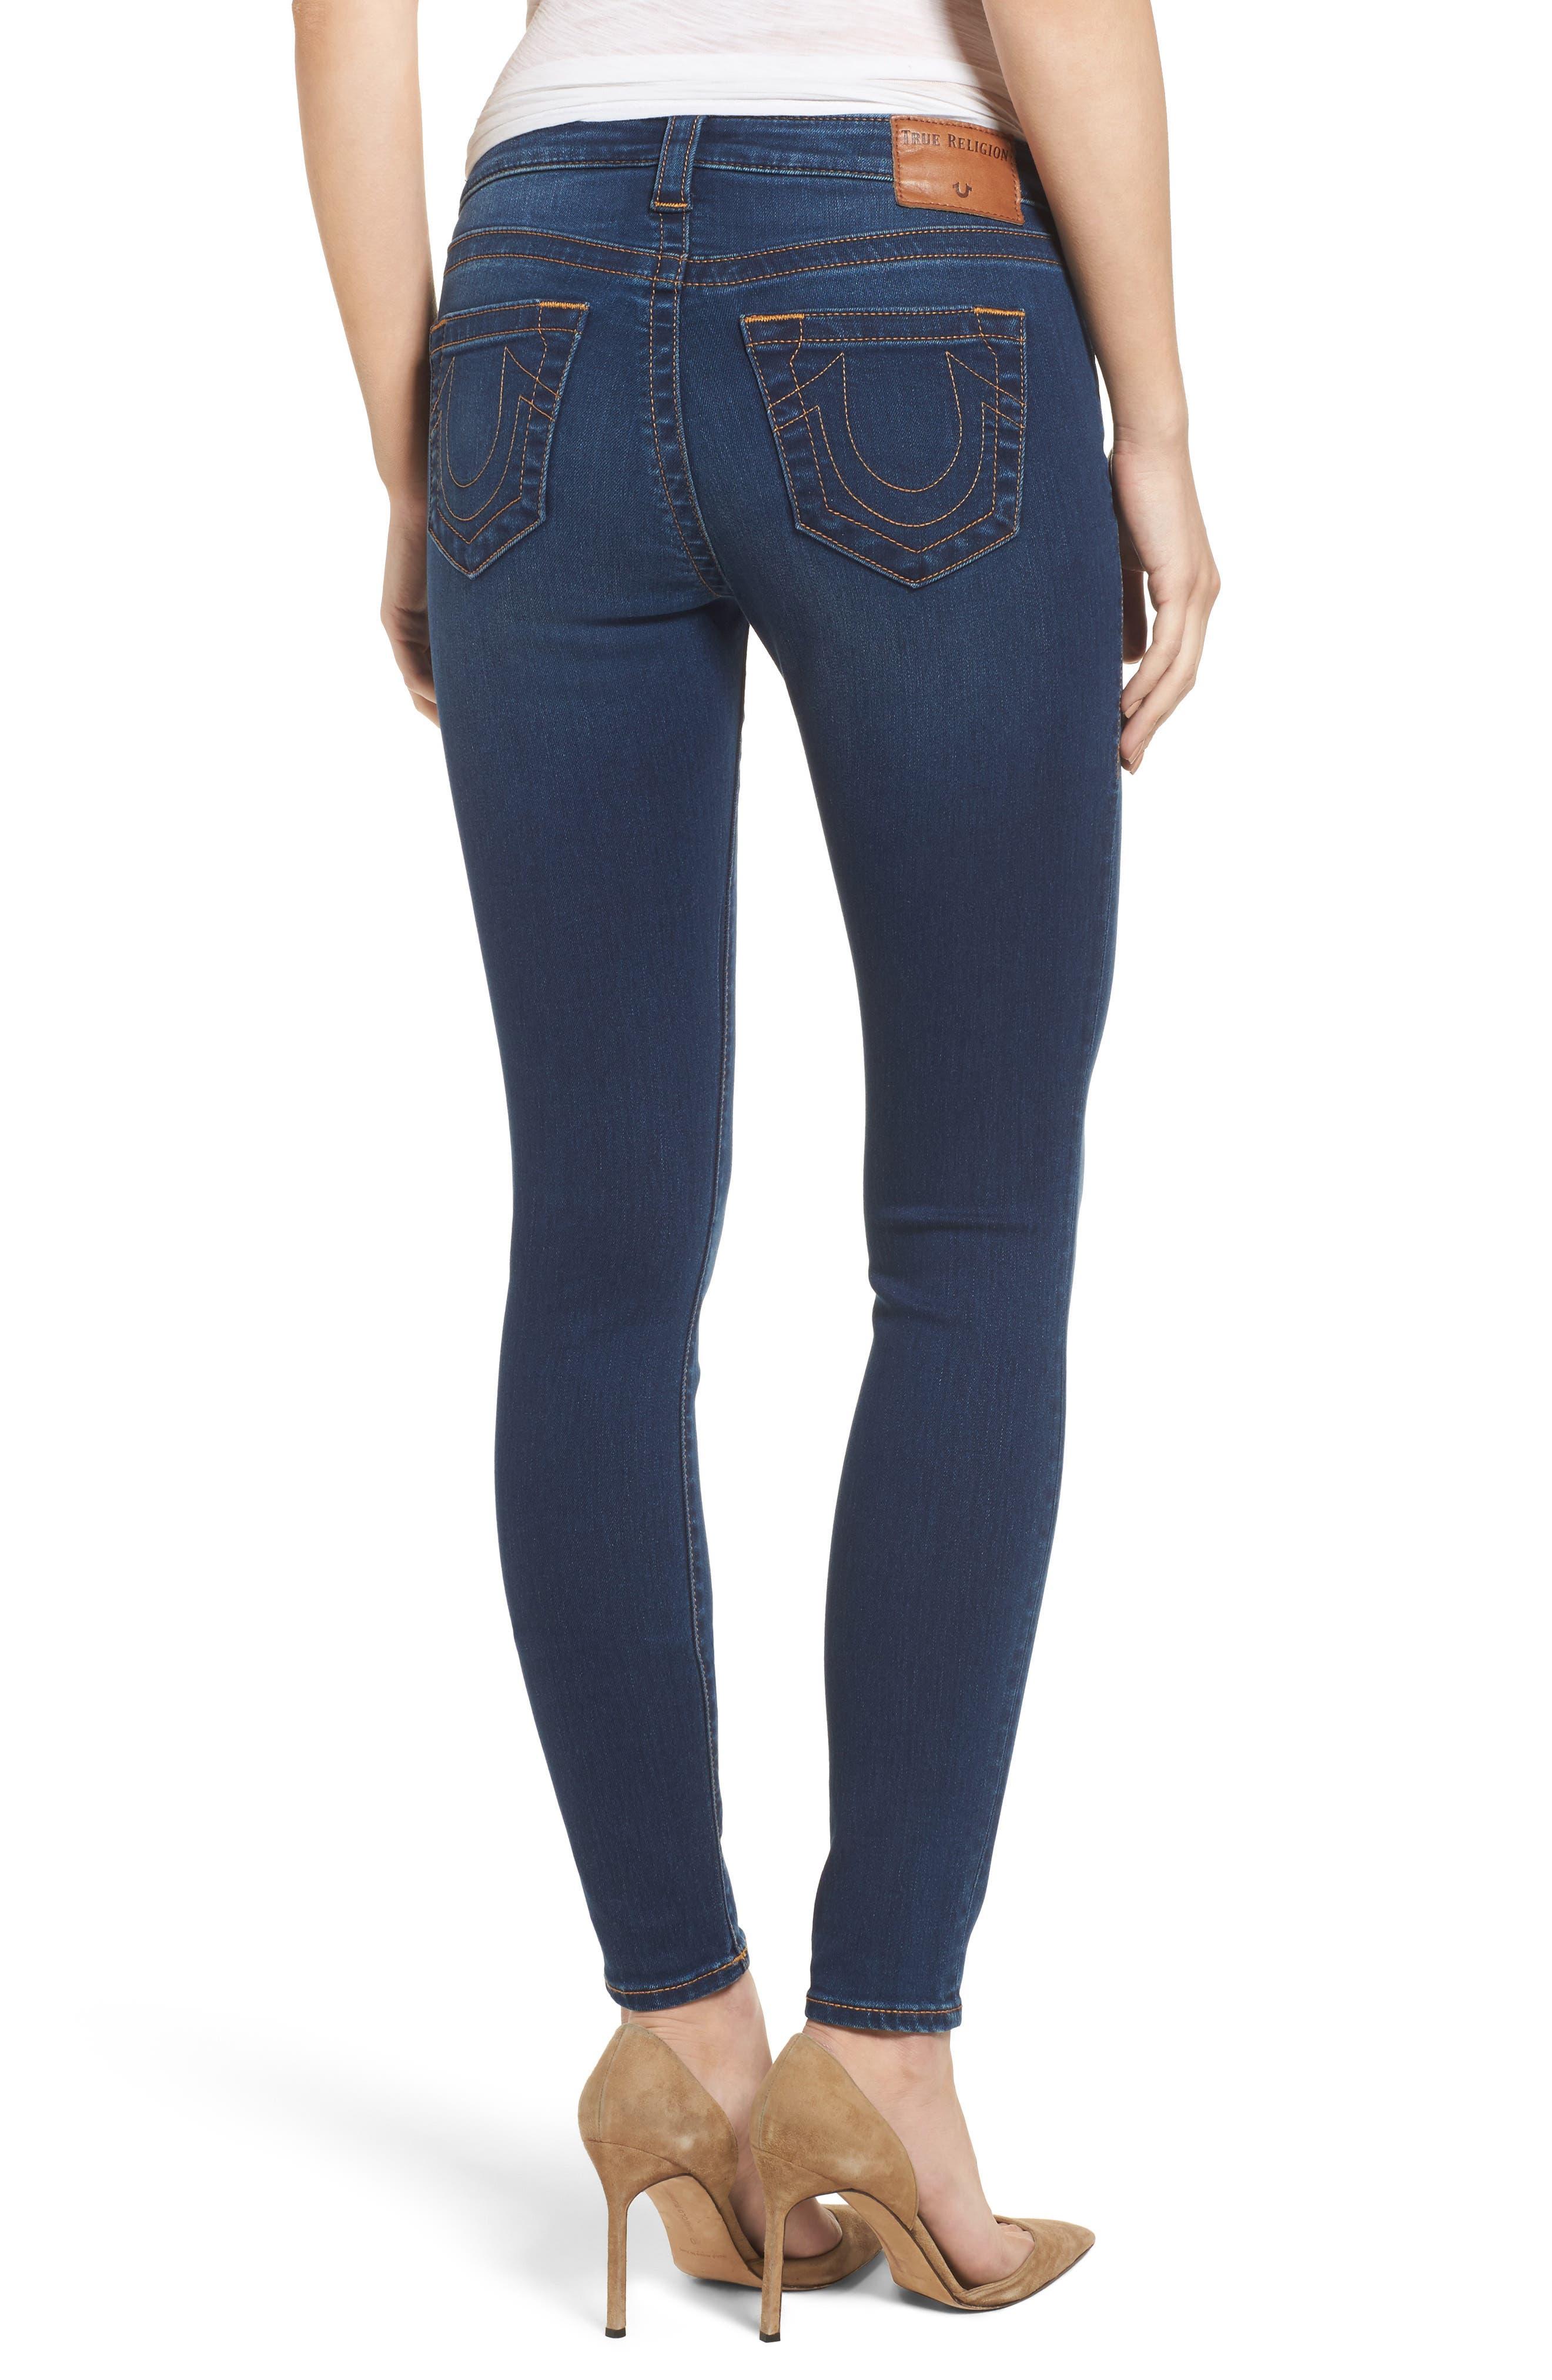 TRUE RELIGION BRAND JEANS,                             Halle Mid Rise Skinny Jeans,                             Alternate thumbnail 2, color,                             400